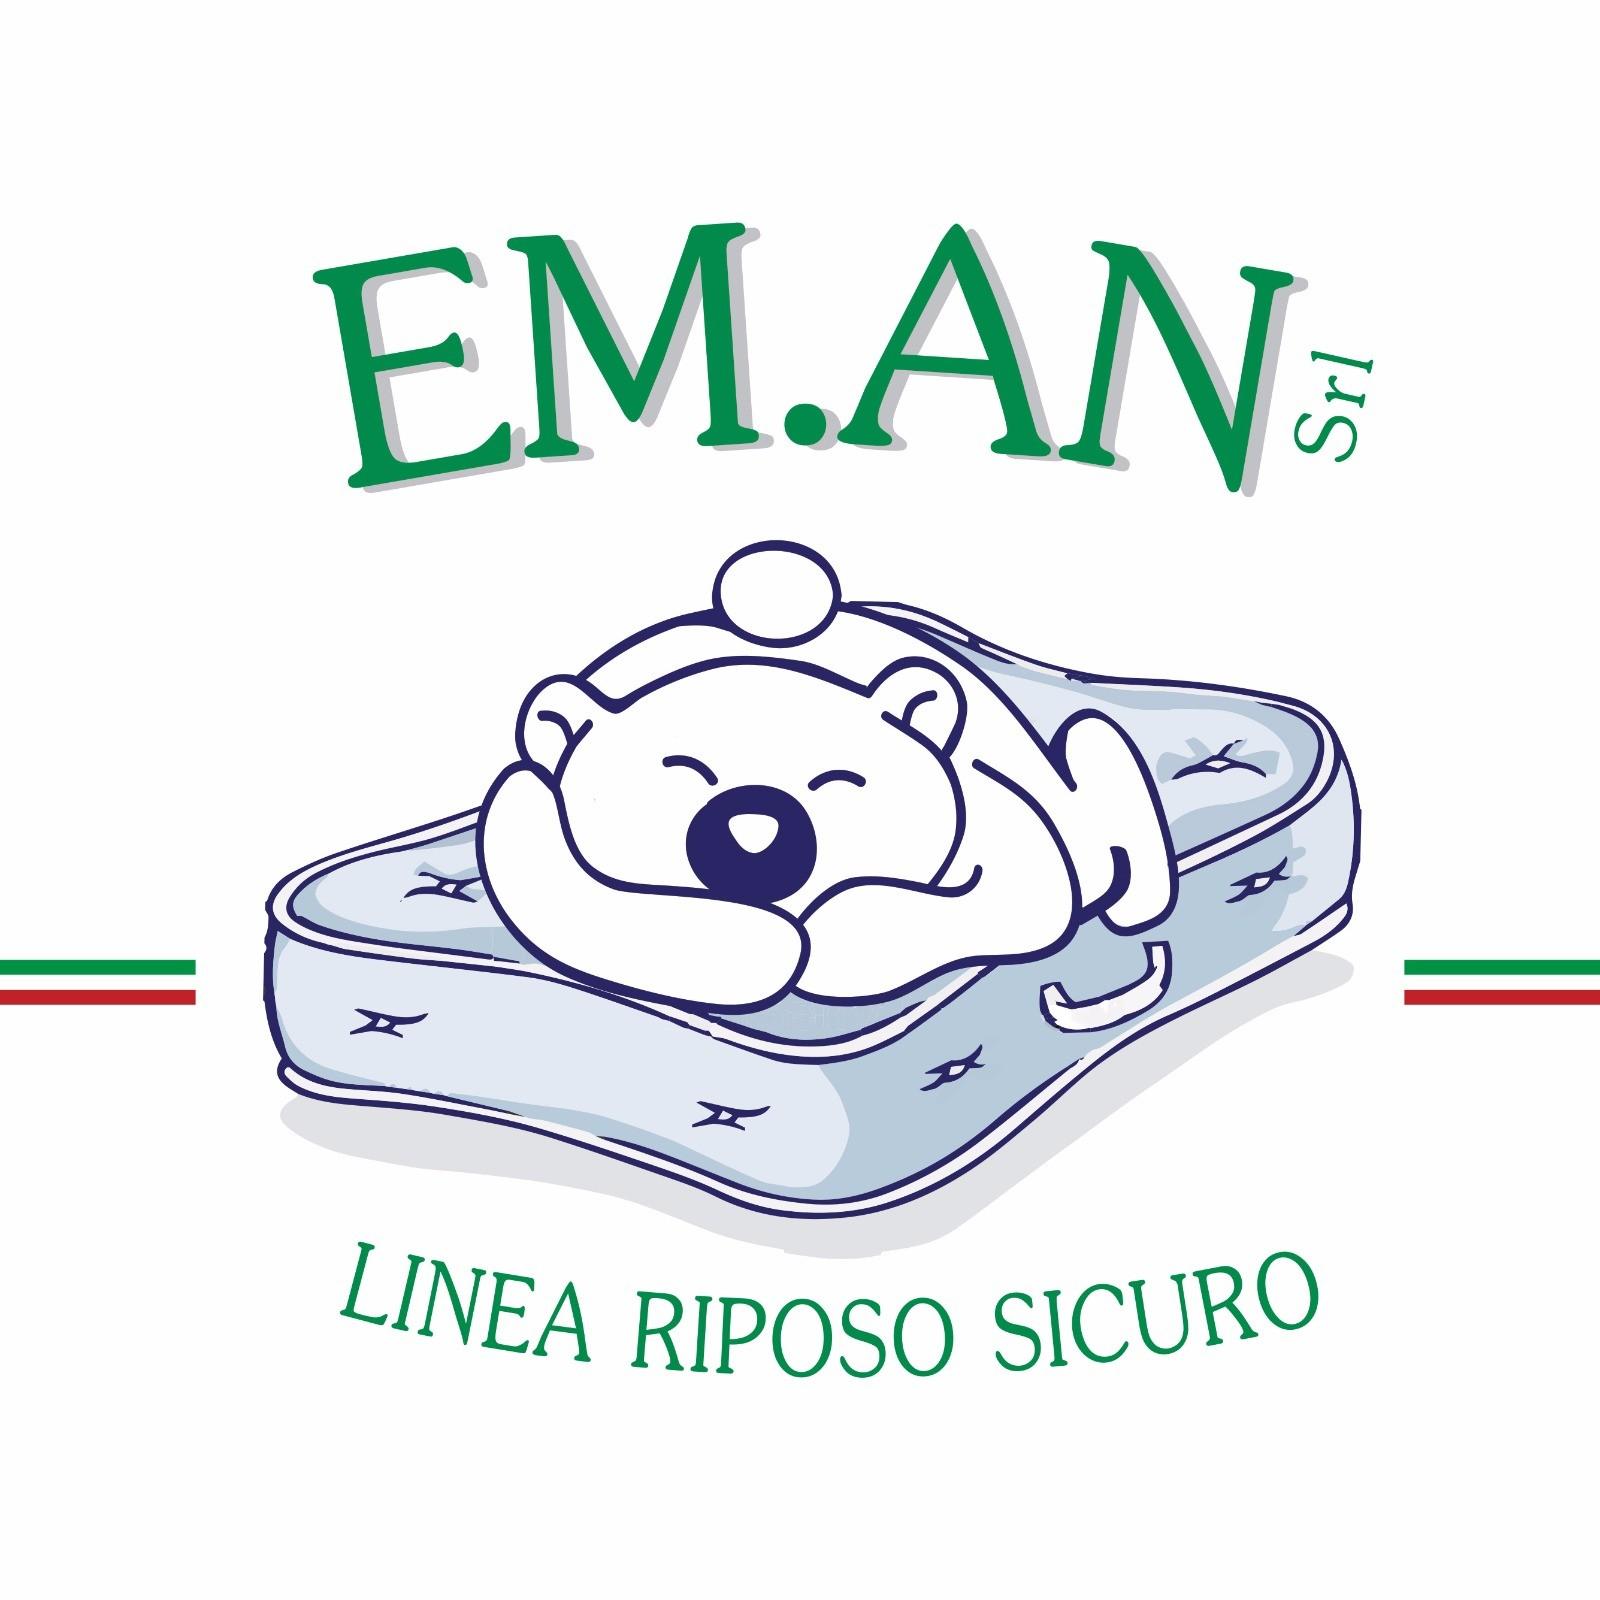 Linea Riposo Sicuro by Em.An. Srls